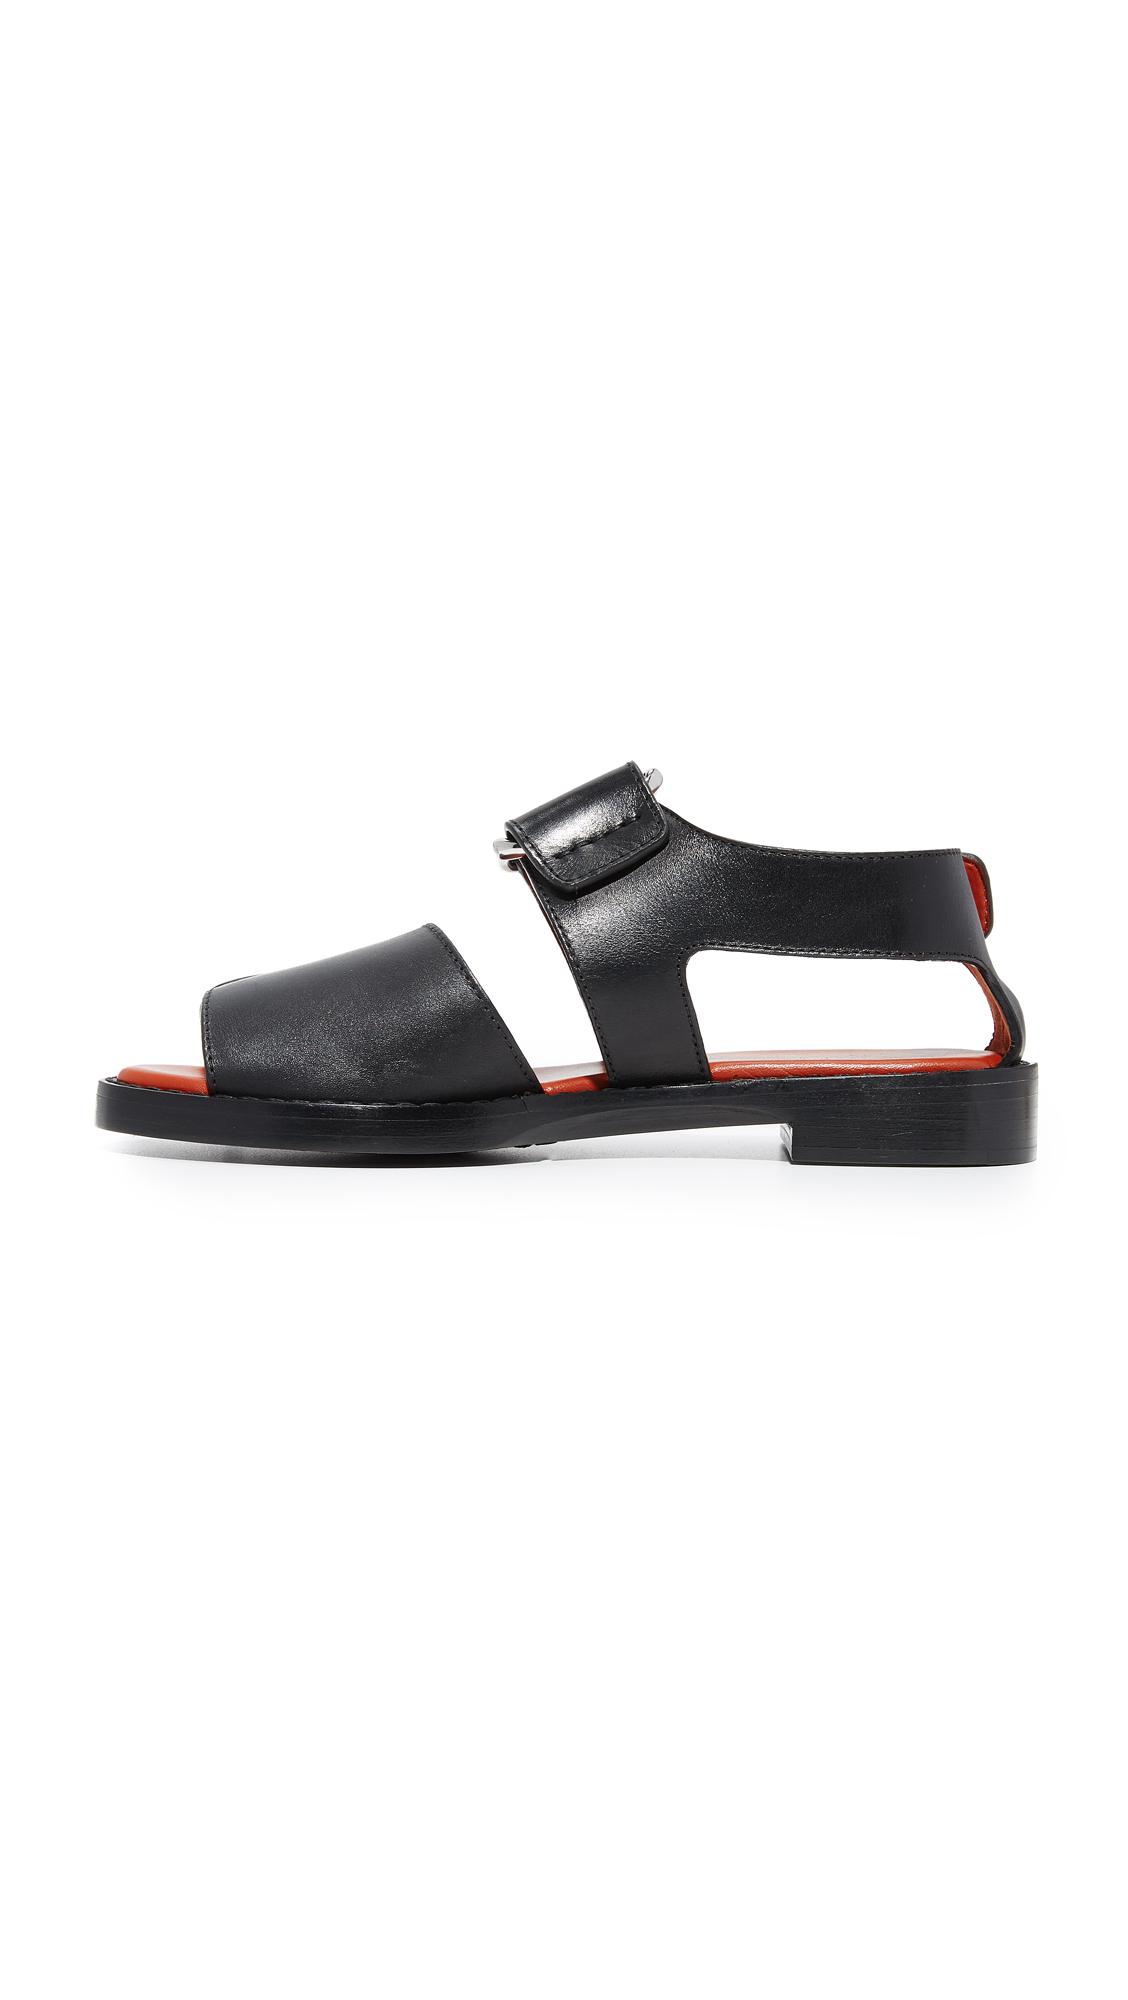 Phillip 3 1 Flat SandalsShopbop Addis Lim W9Y2EDHI